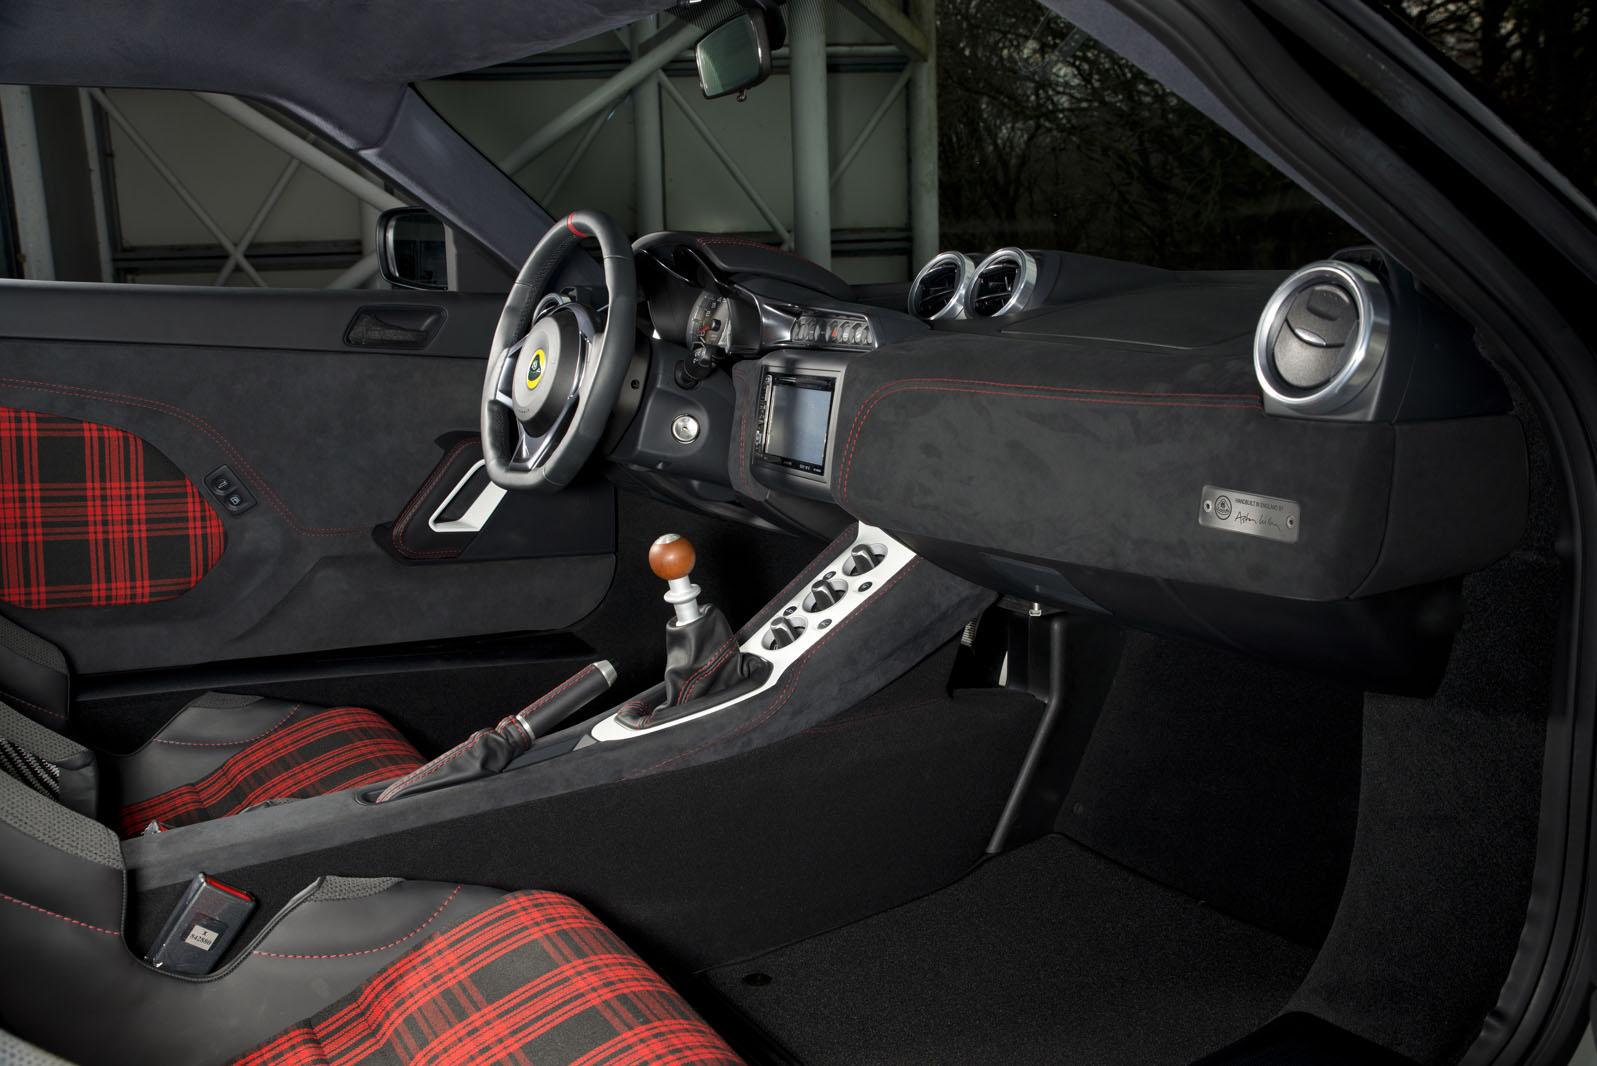 https://images.cdn.autocar.co.uk/sites/autocar.co.uk/files/images/car-reviews/first-drives/legacy/james_bond_4.jpg